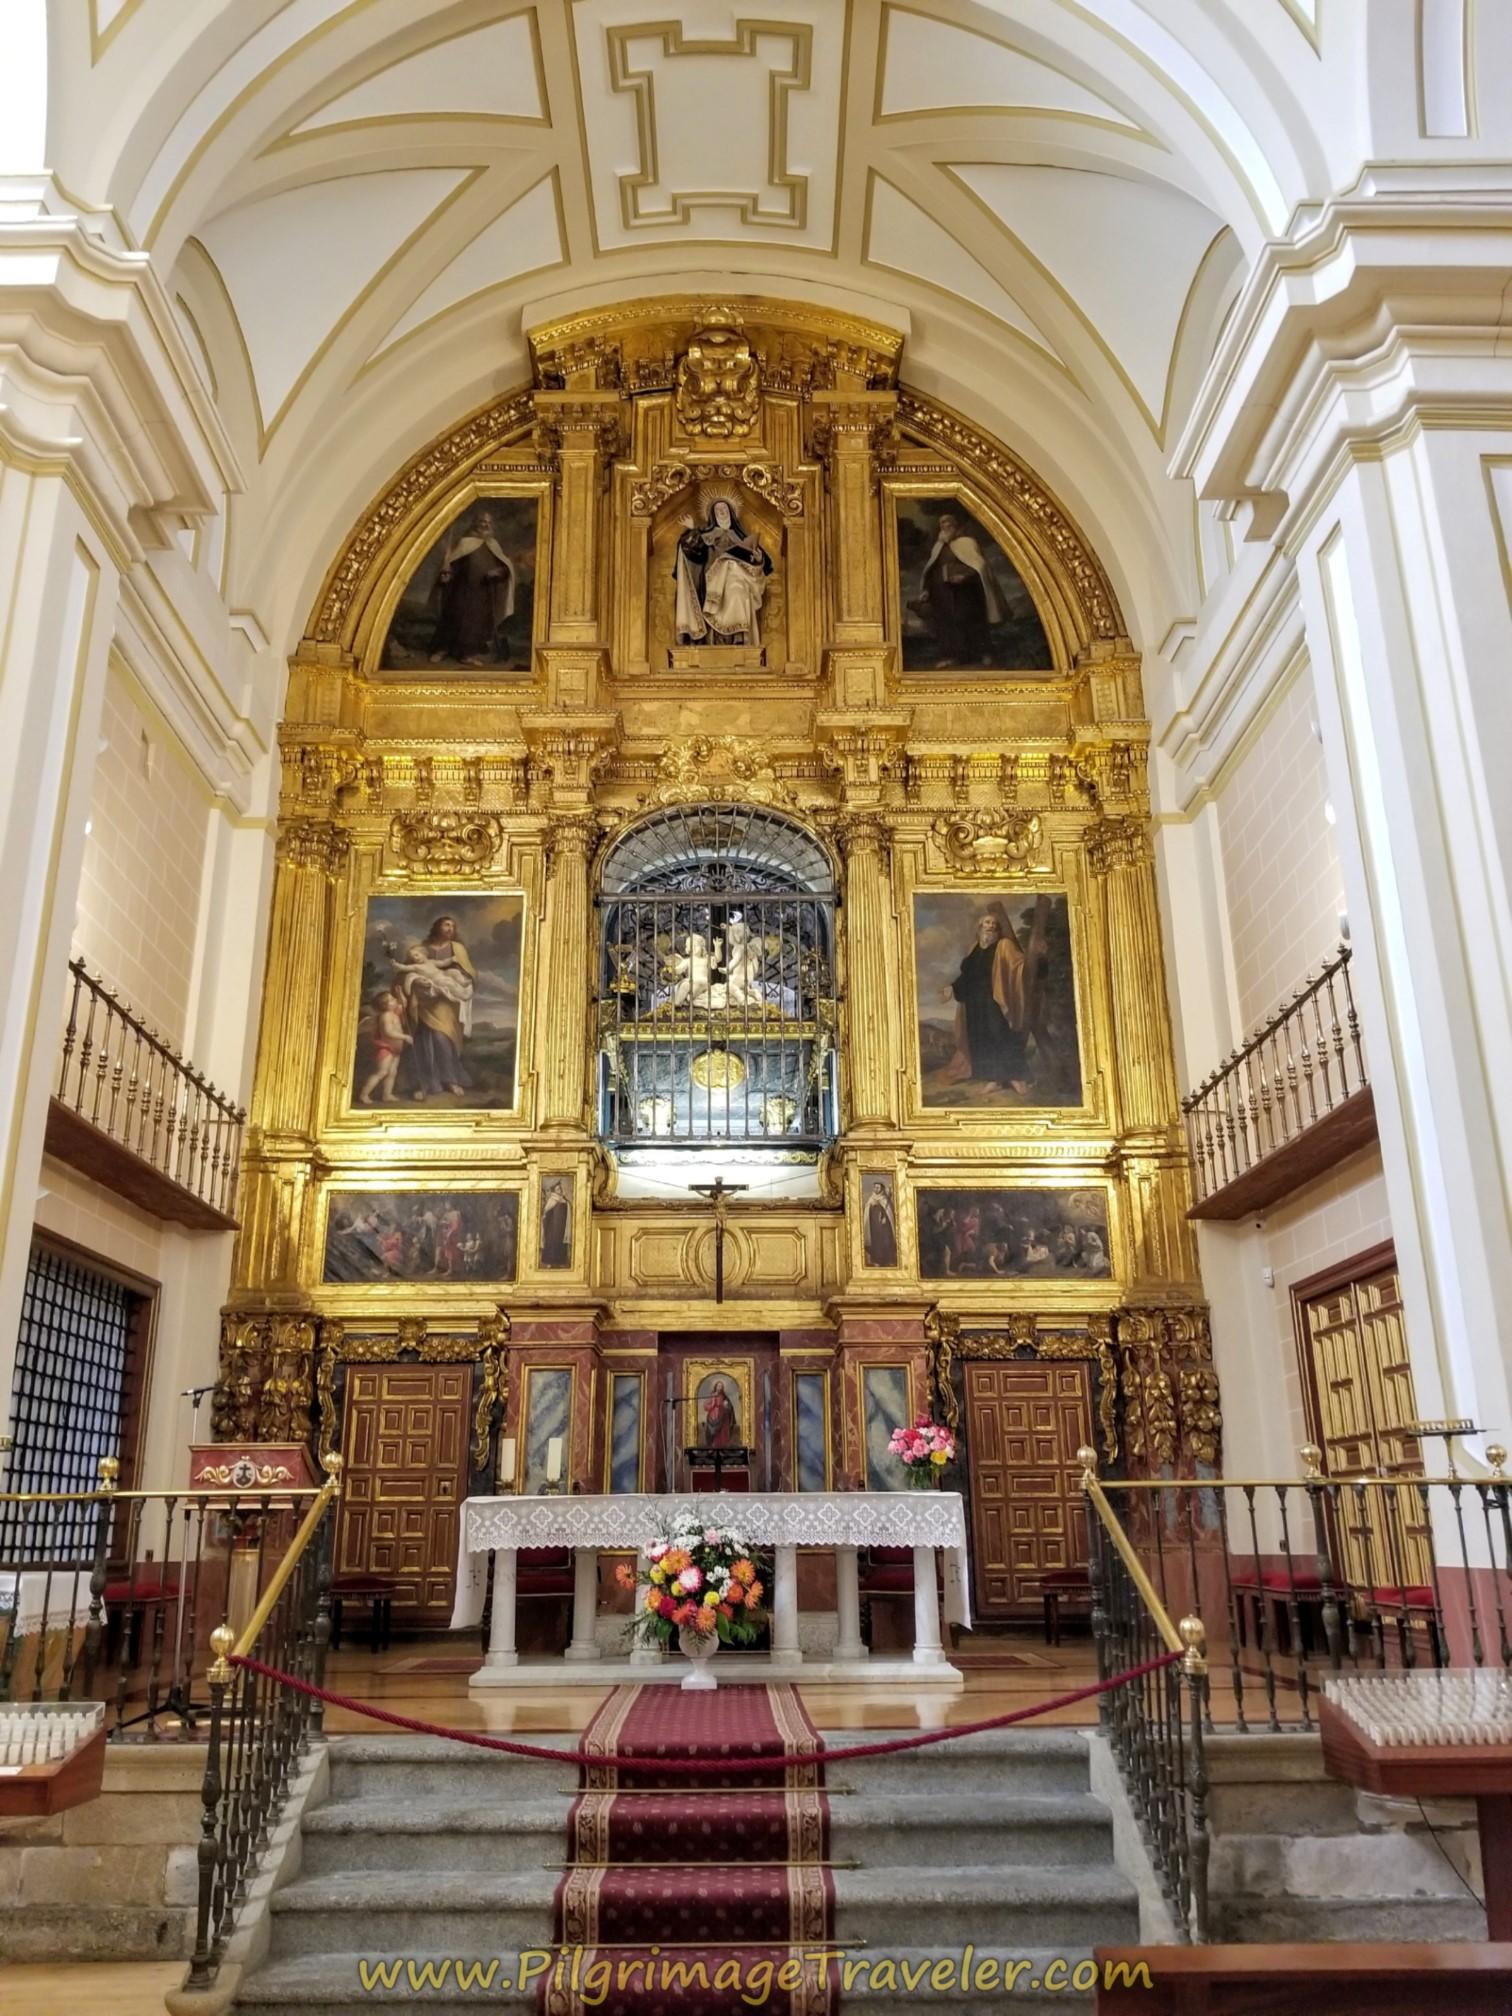 Tomb of St. Teresa on the Altar of the Iglesia de Anunciación, Alba de Tormes